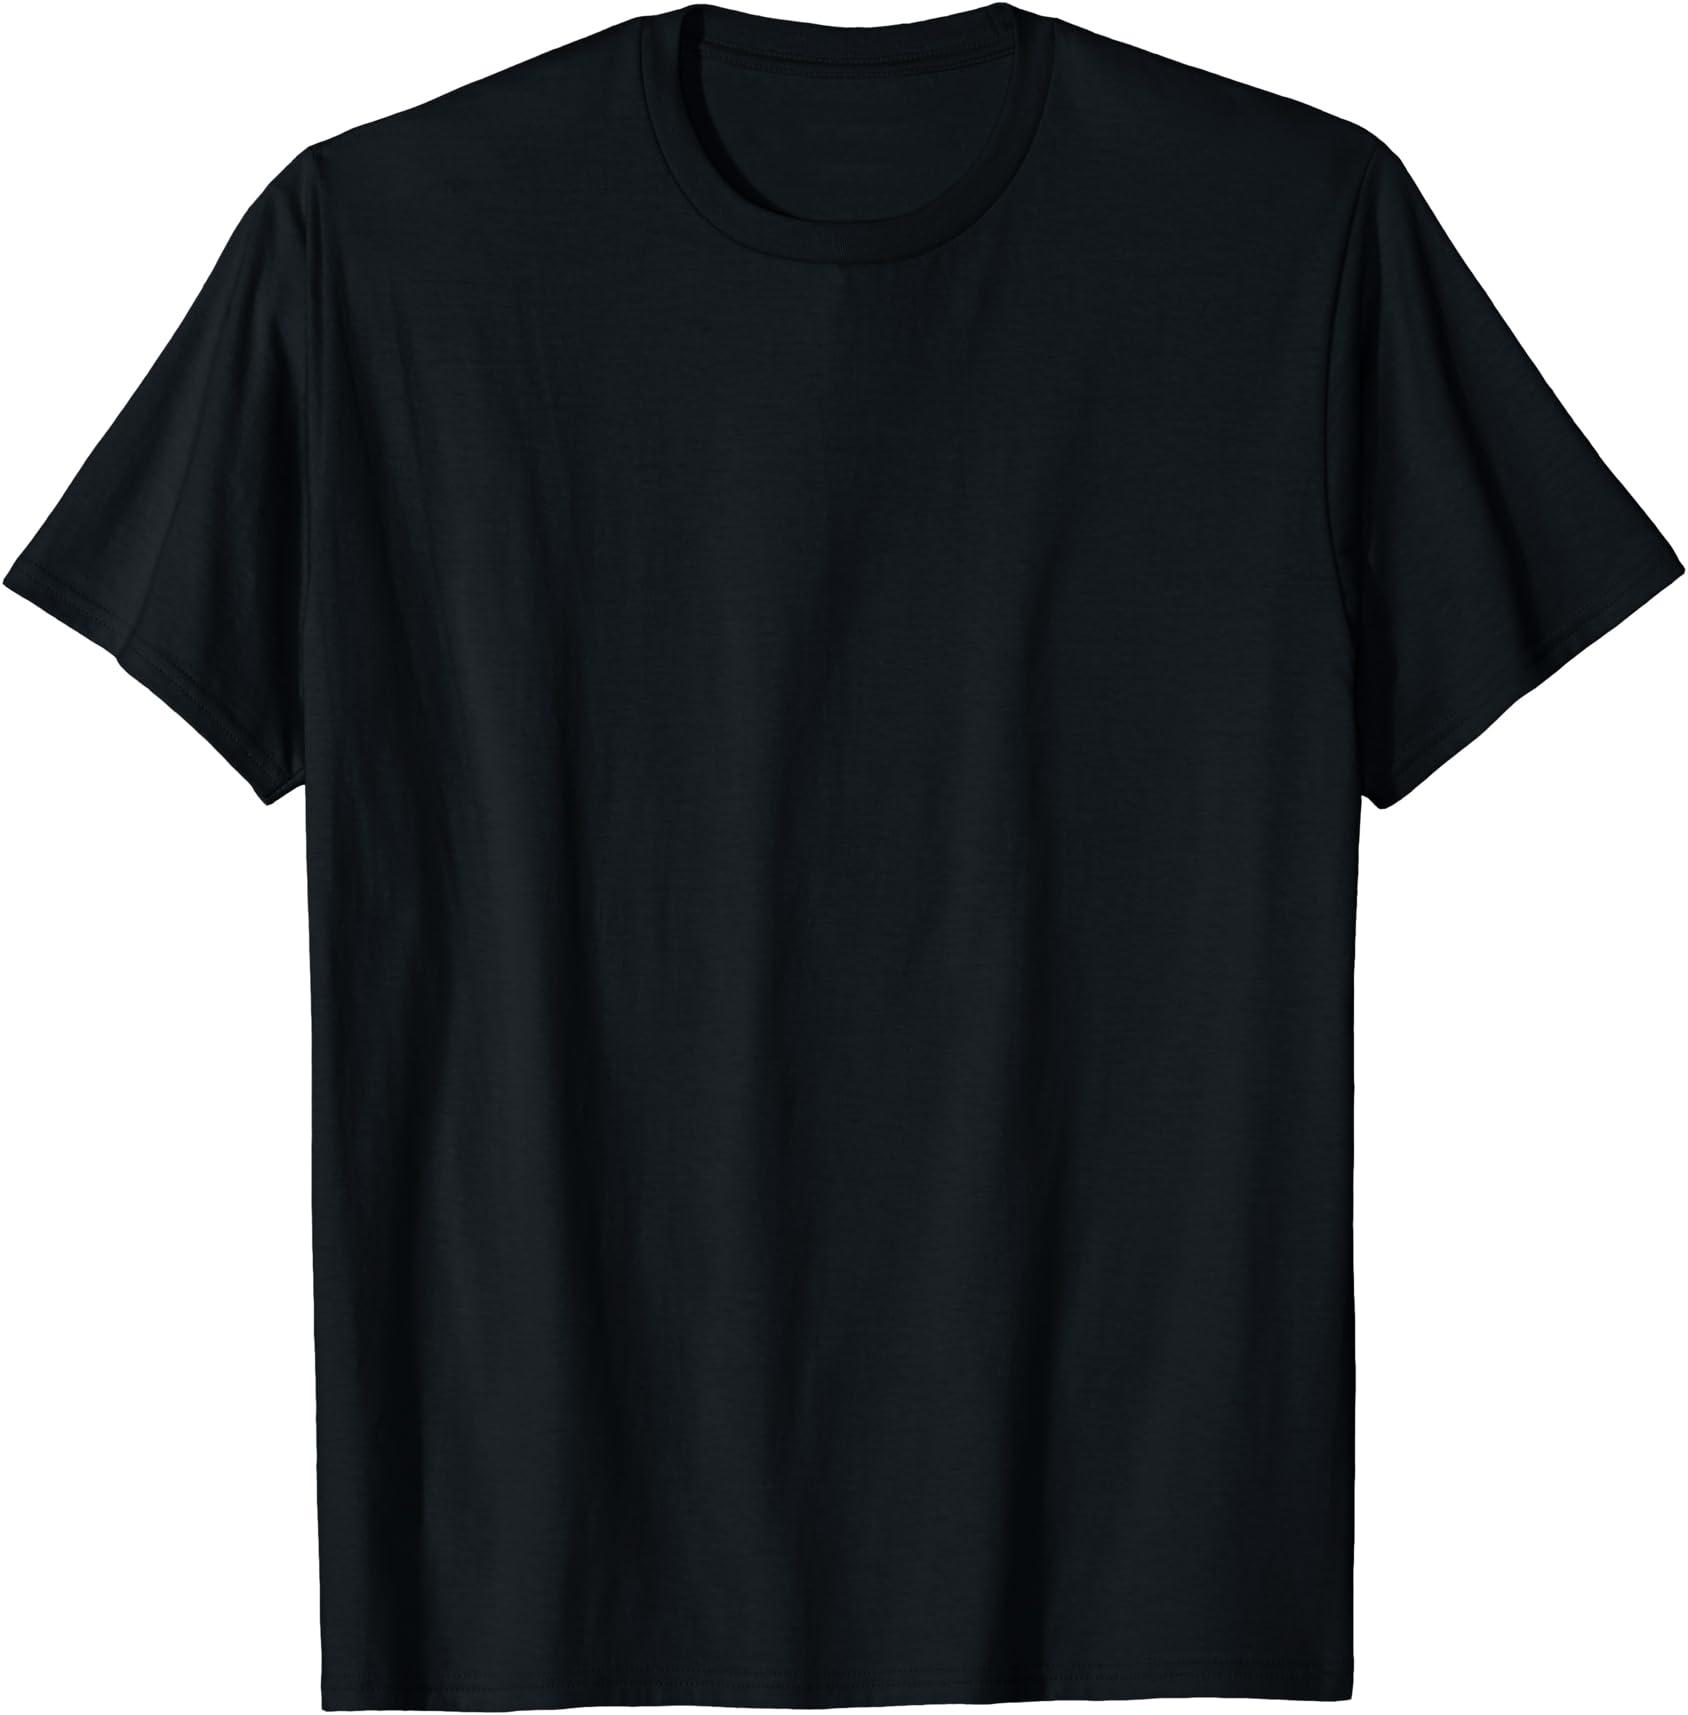 SEASHELLS BY THE SEASHORE Beach Art Adult T-Shirt All Sizes